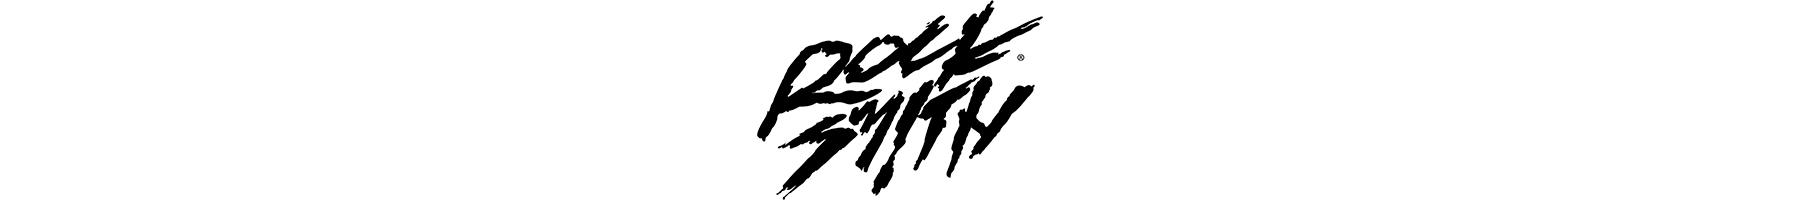 DrJays.com - Rocksmith